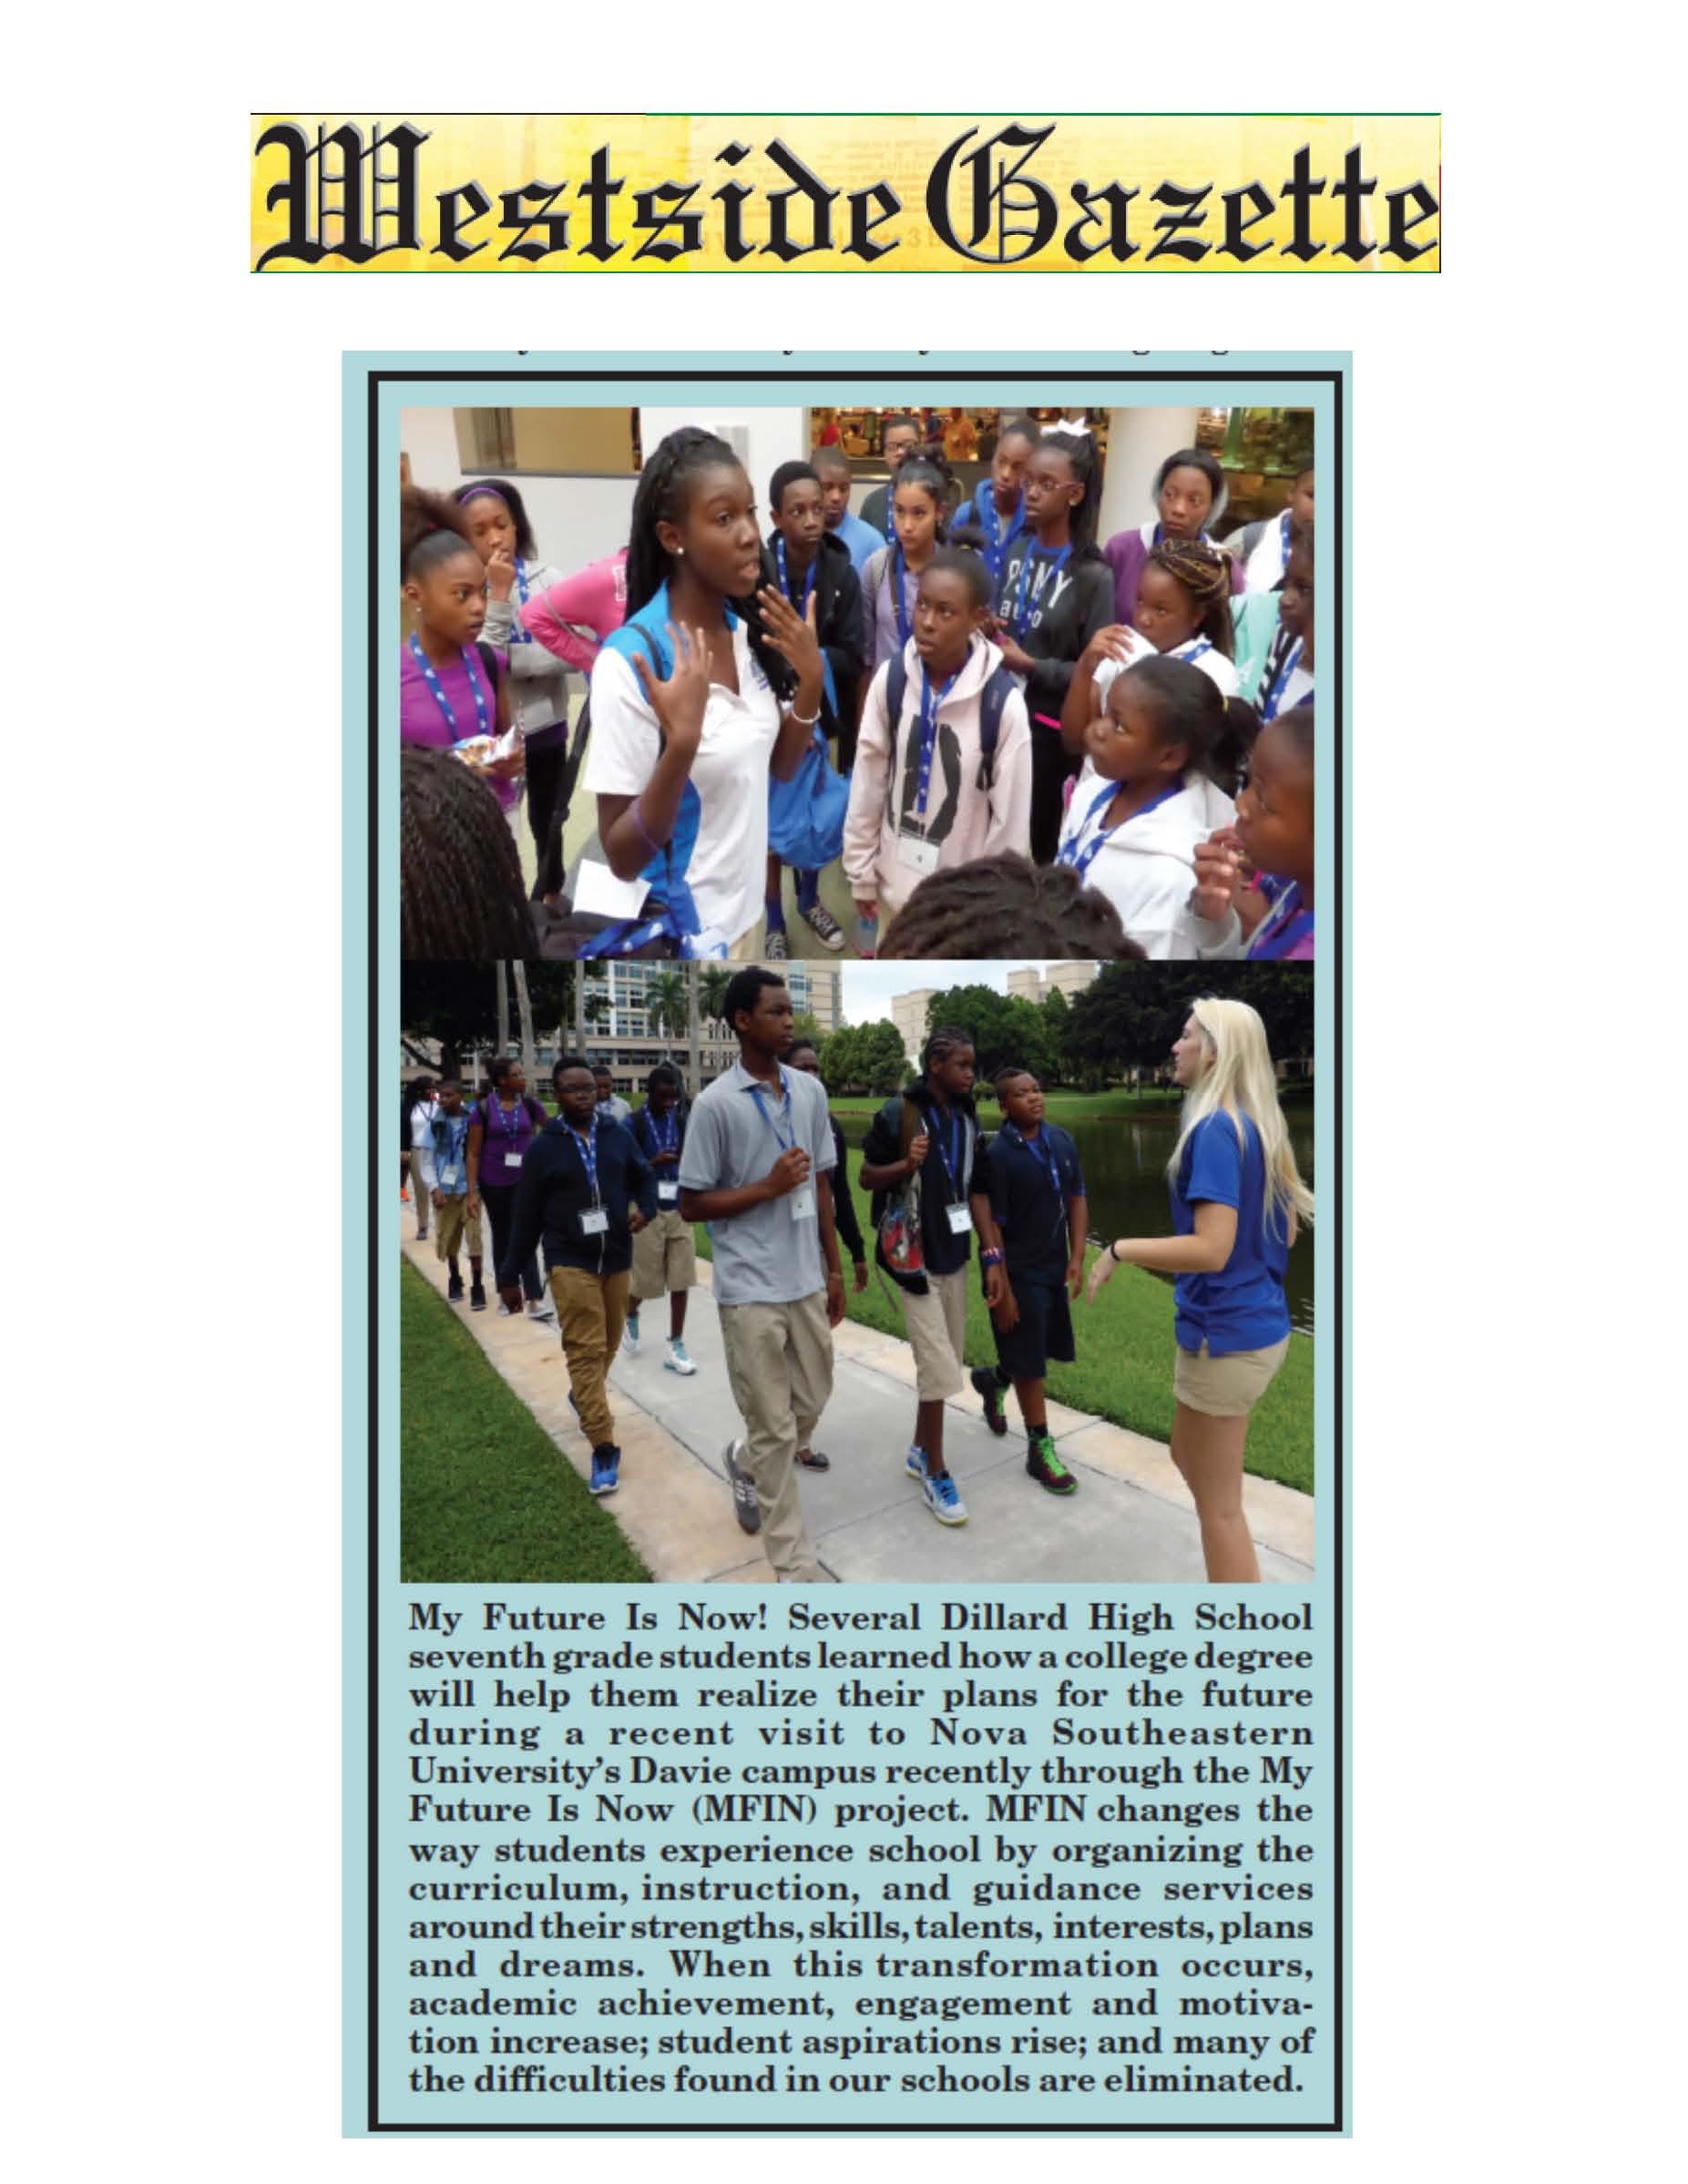 BE96C3E3-3B9ACA00-3-Westside Gazette 11-12-15 Dillard NSU.docx